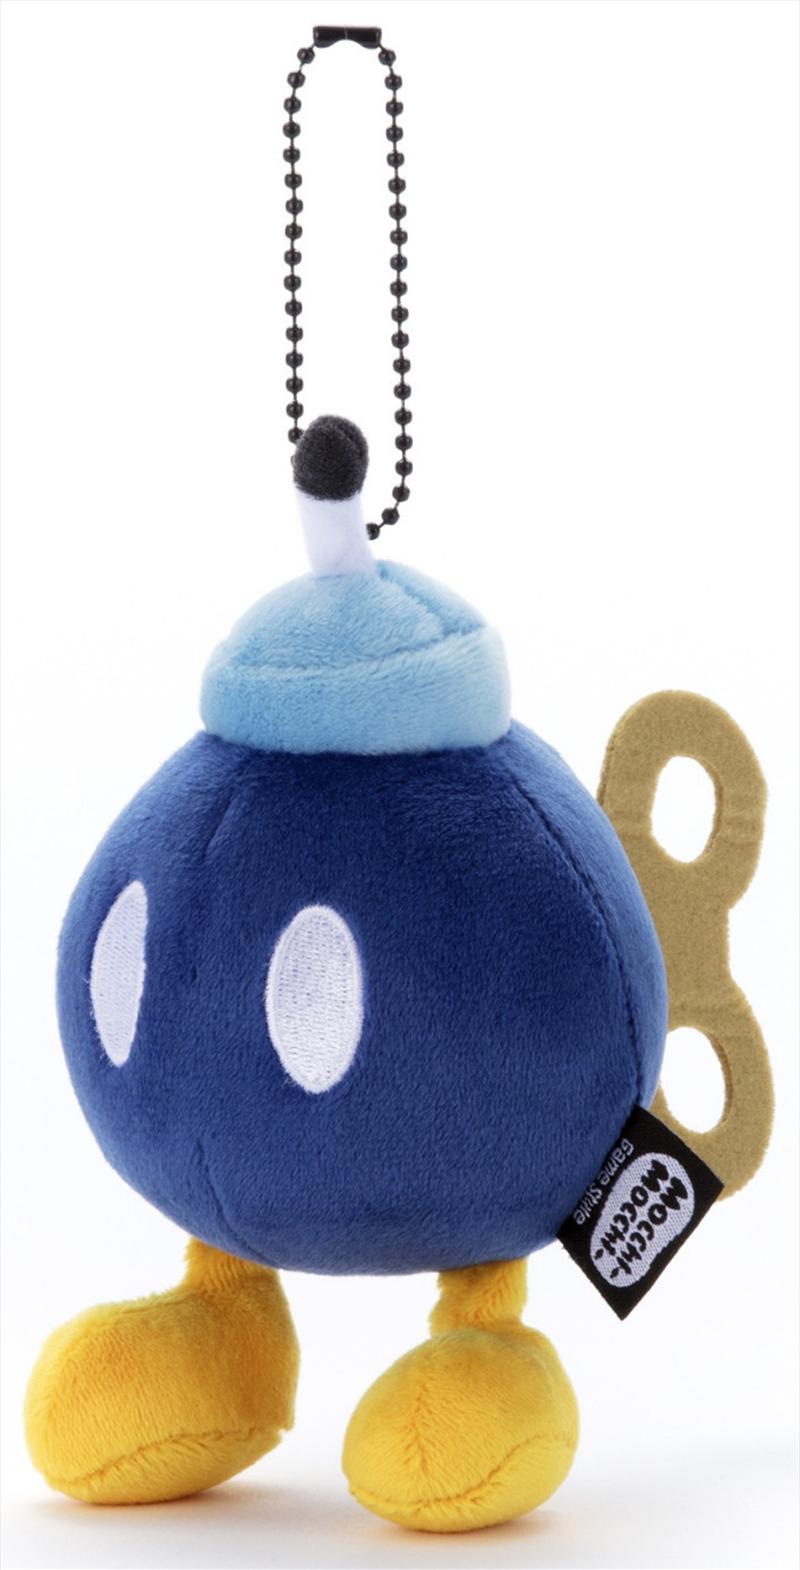 Mocchi Mocchi Mario Kart Plush Small Bomb   Toy